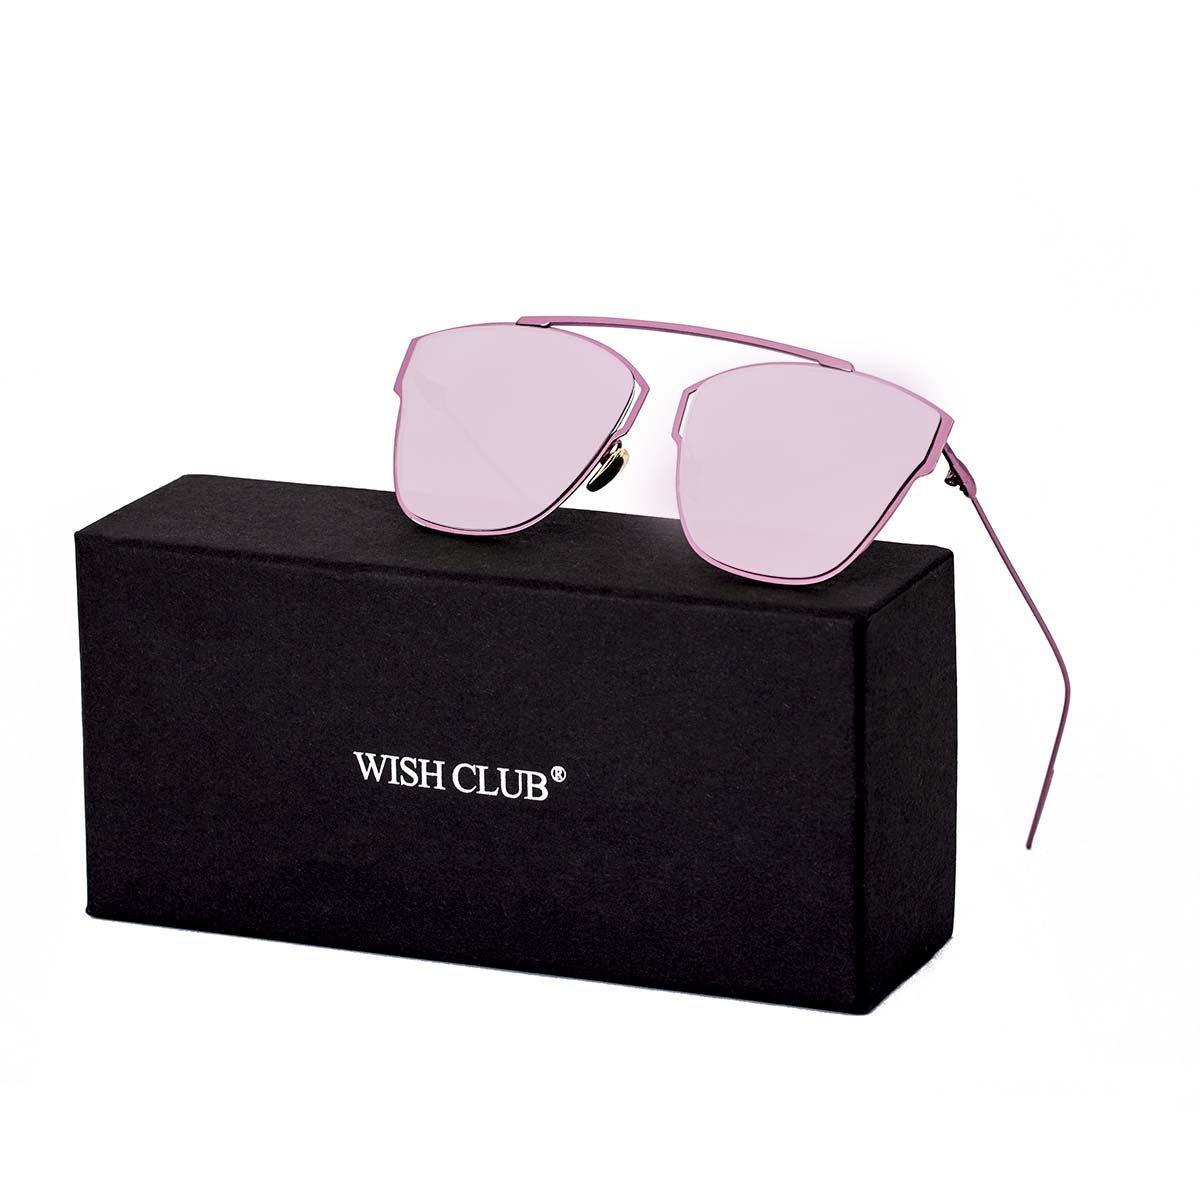 WISH CLUB Women Classic Cat Eye Sunglasses Fashion Round Reflective Mirrored Stylish Light UV 400 Glasses (Pink)